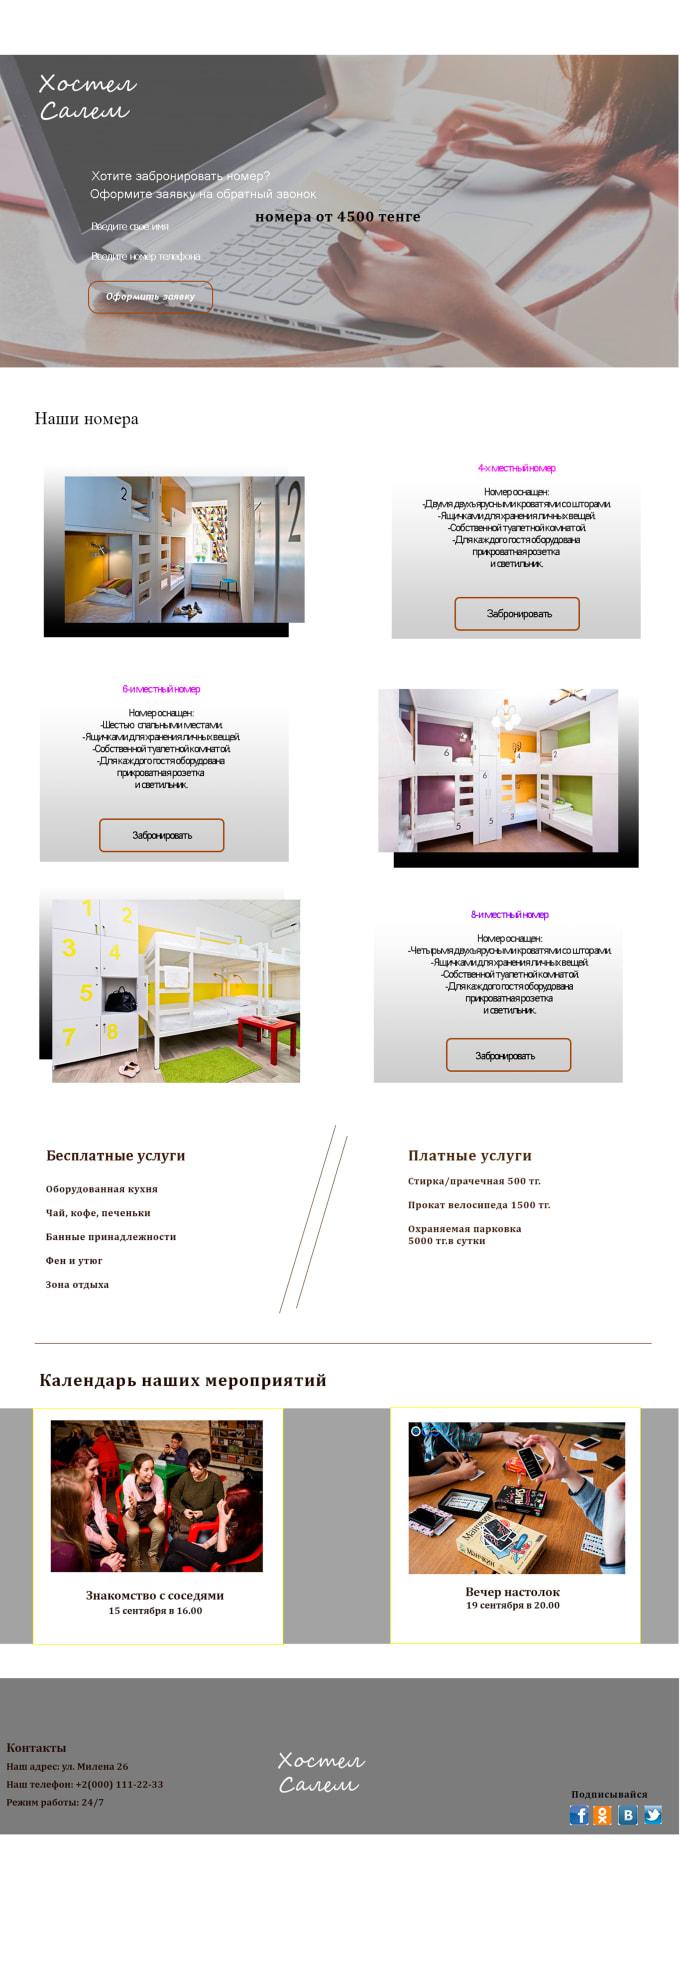 design modern powerpoint and prezi presentation by juldizjuzeeva